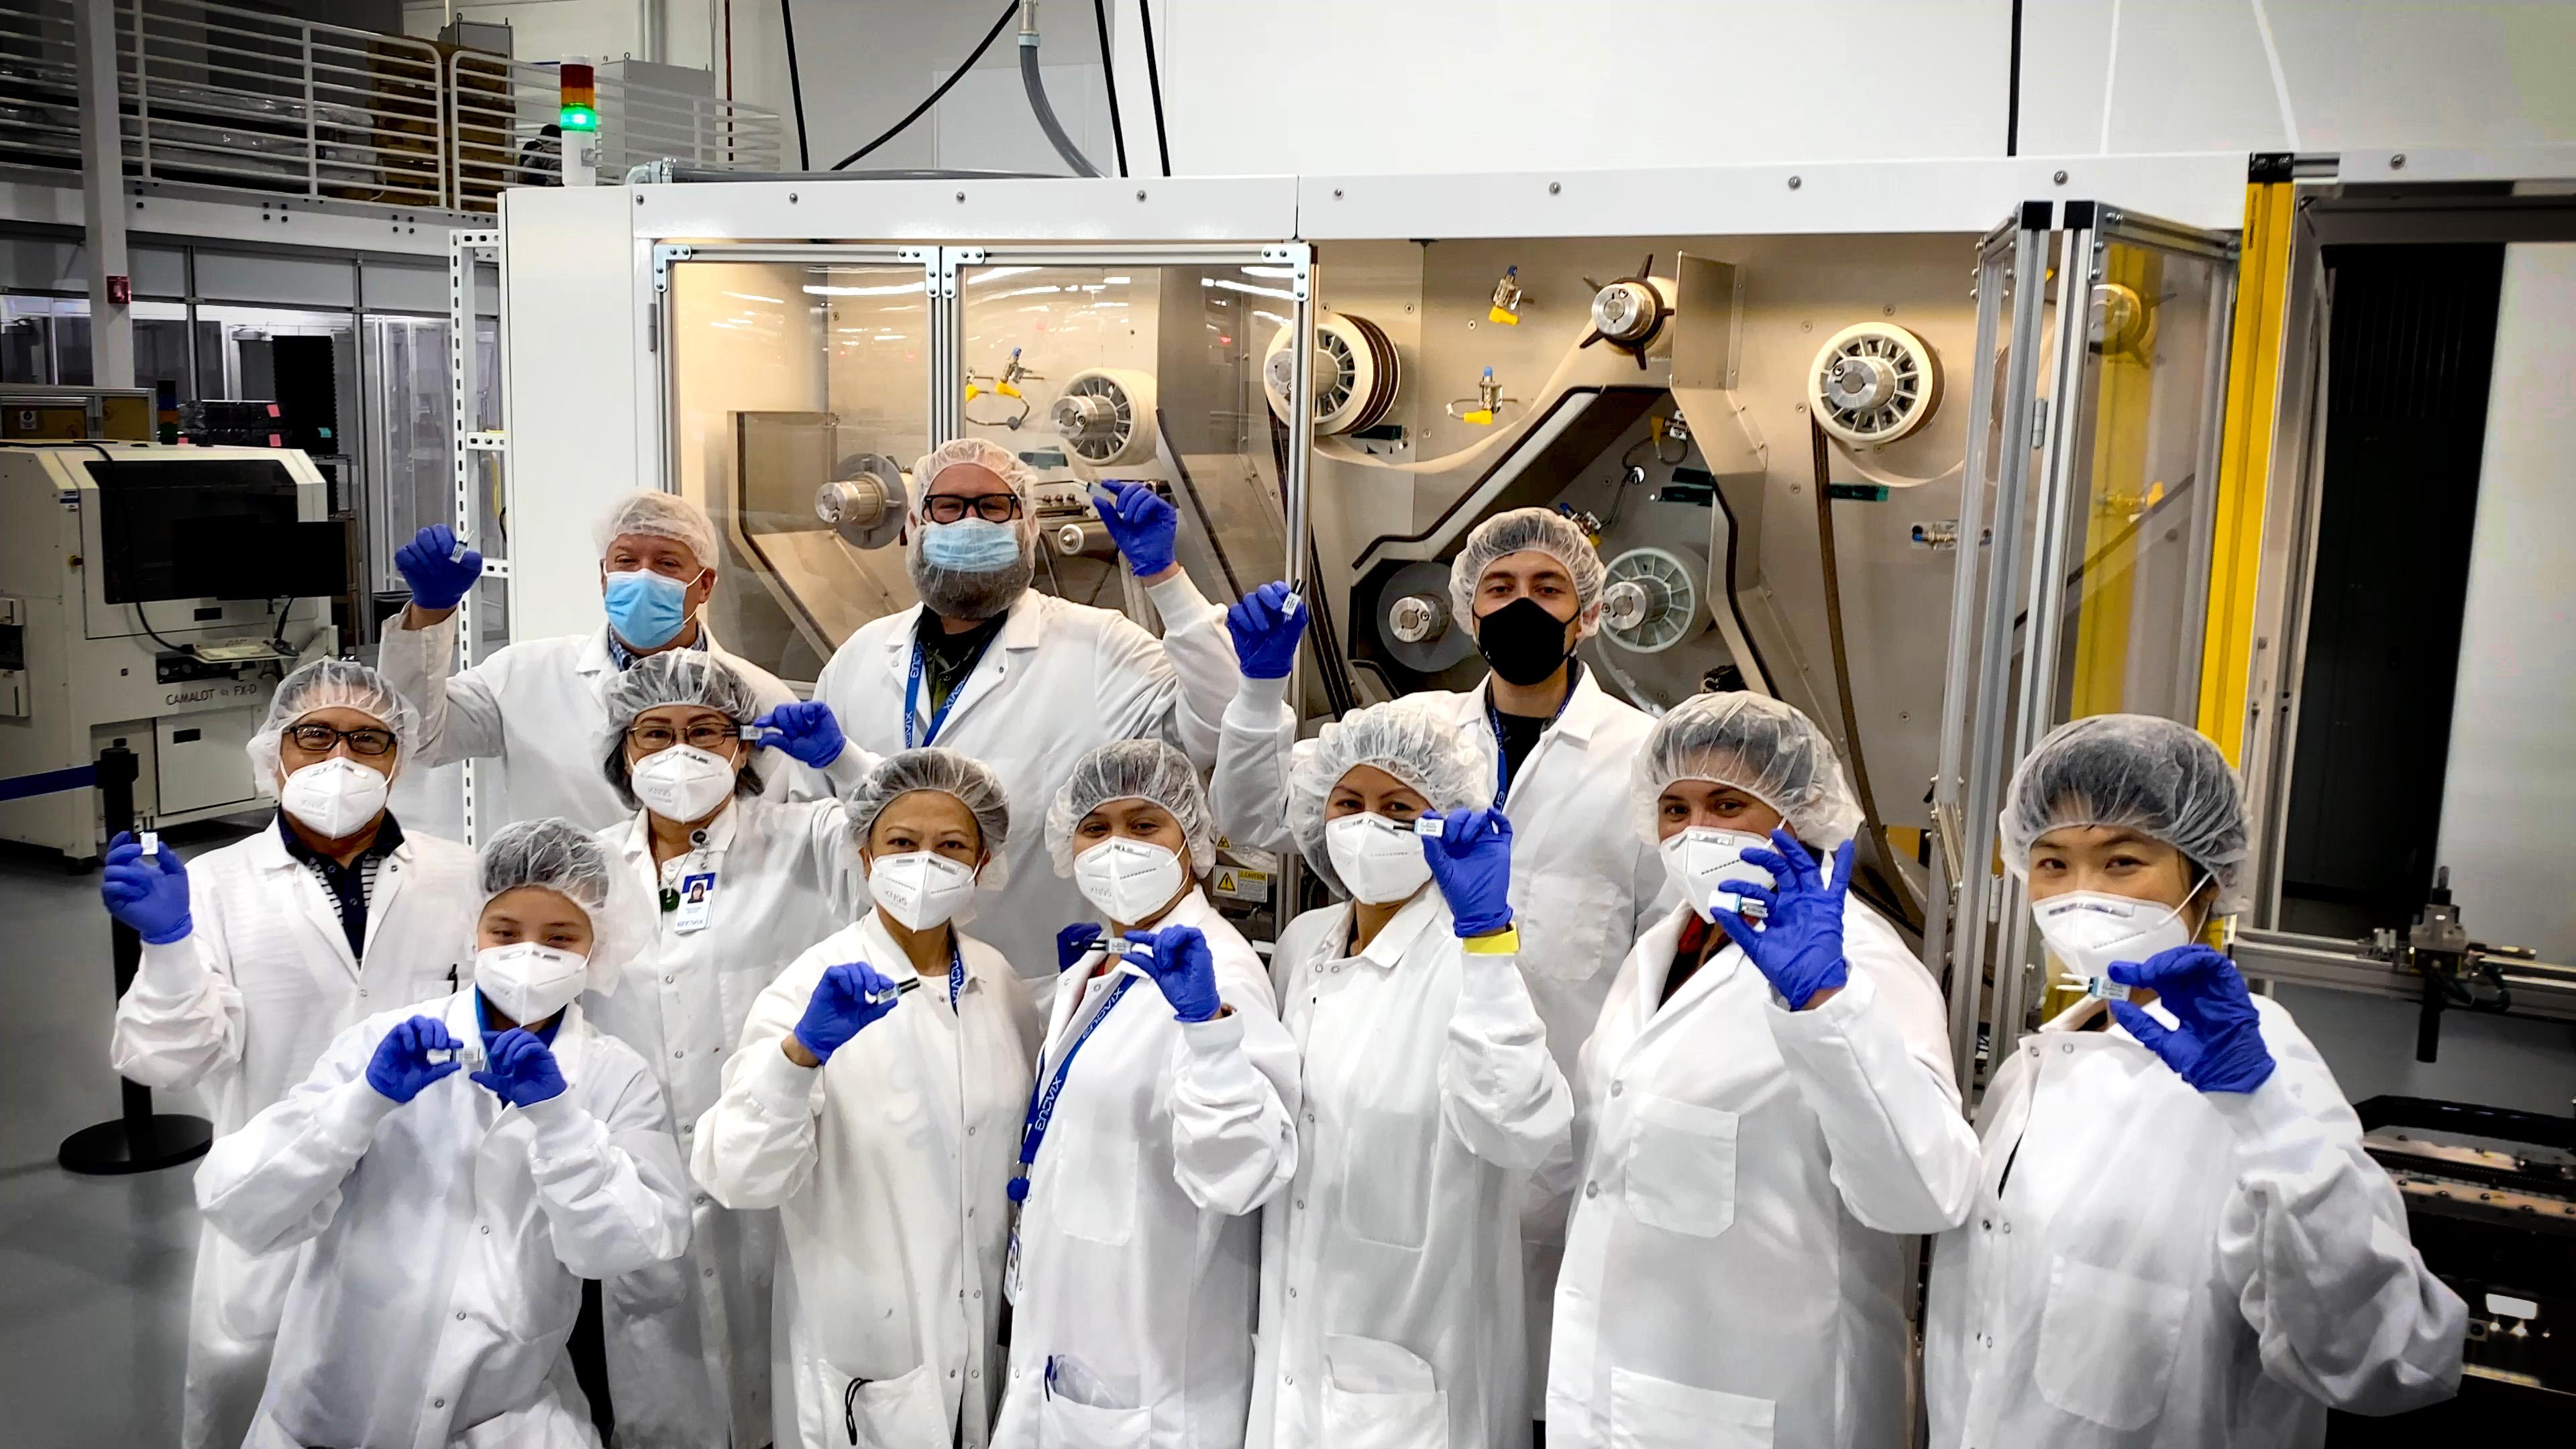 Enovix Meets Major Manufacturing Milestone